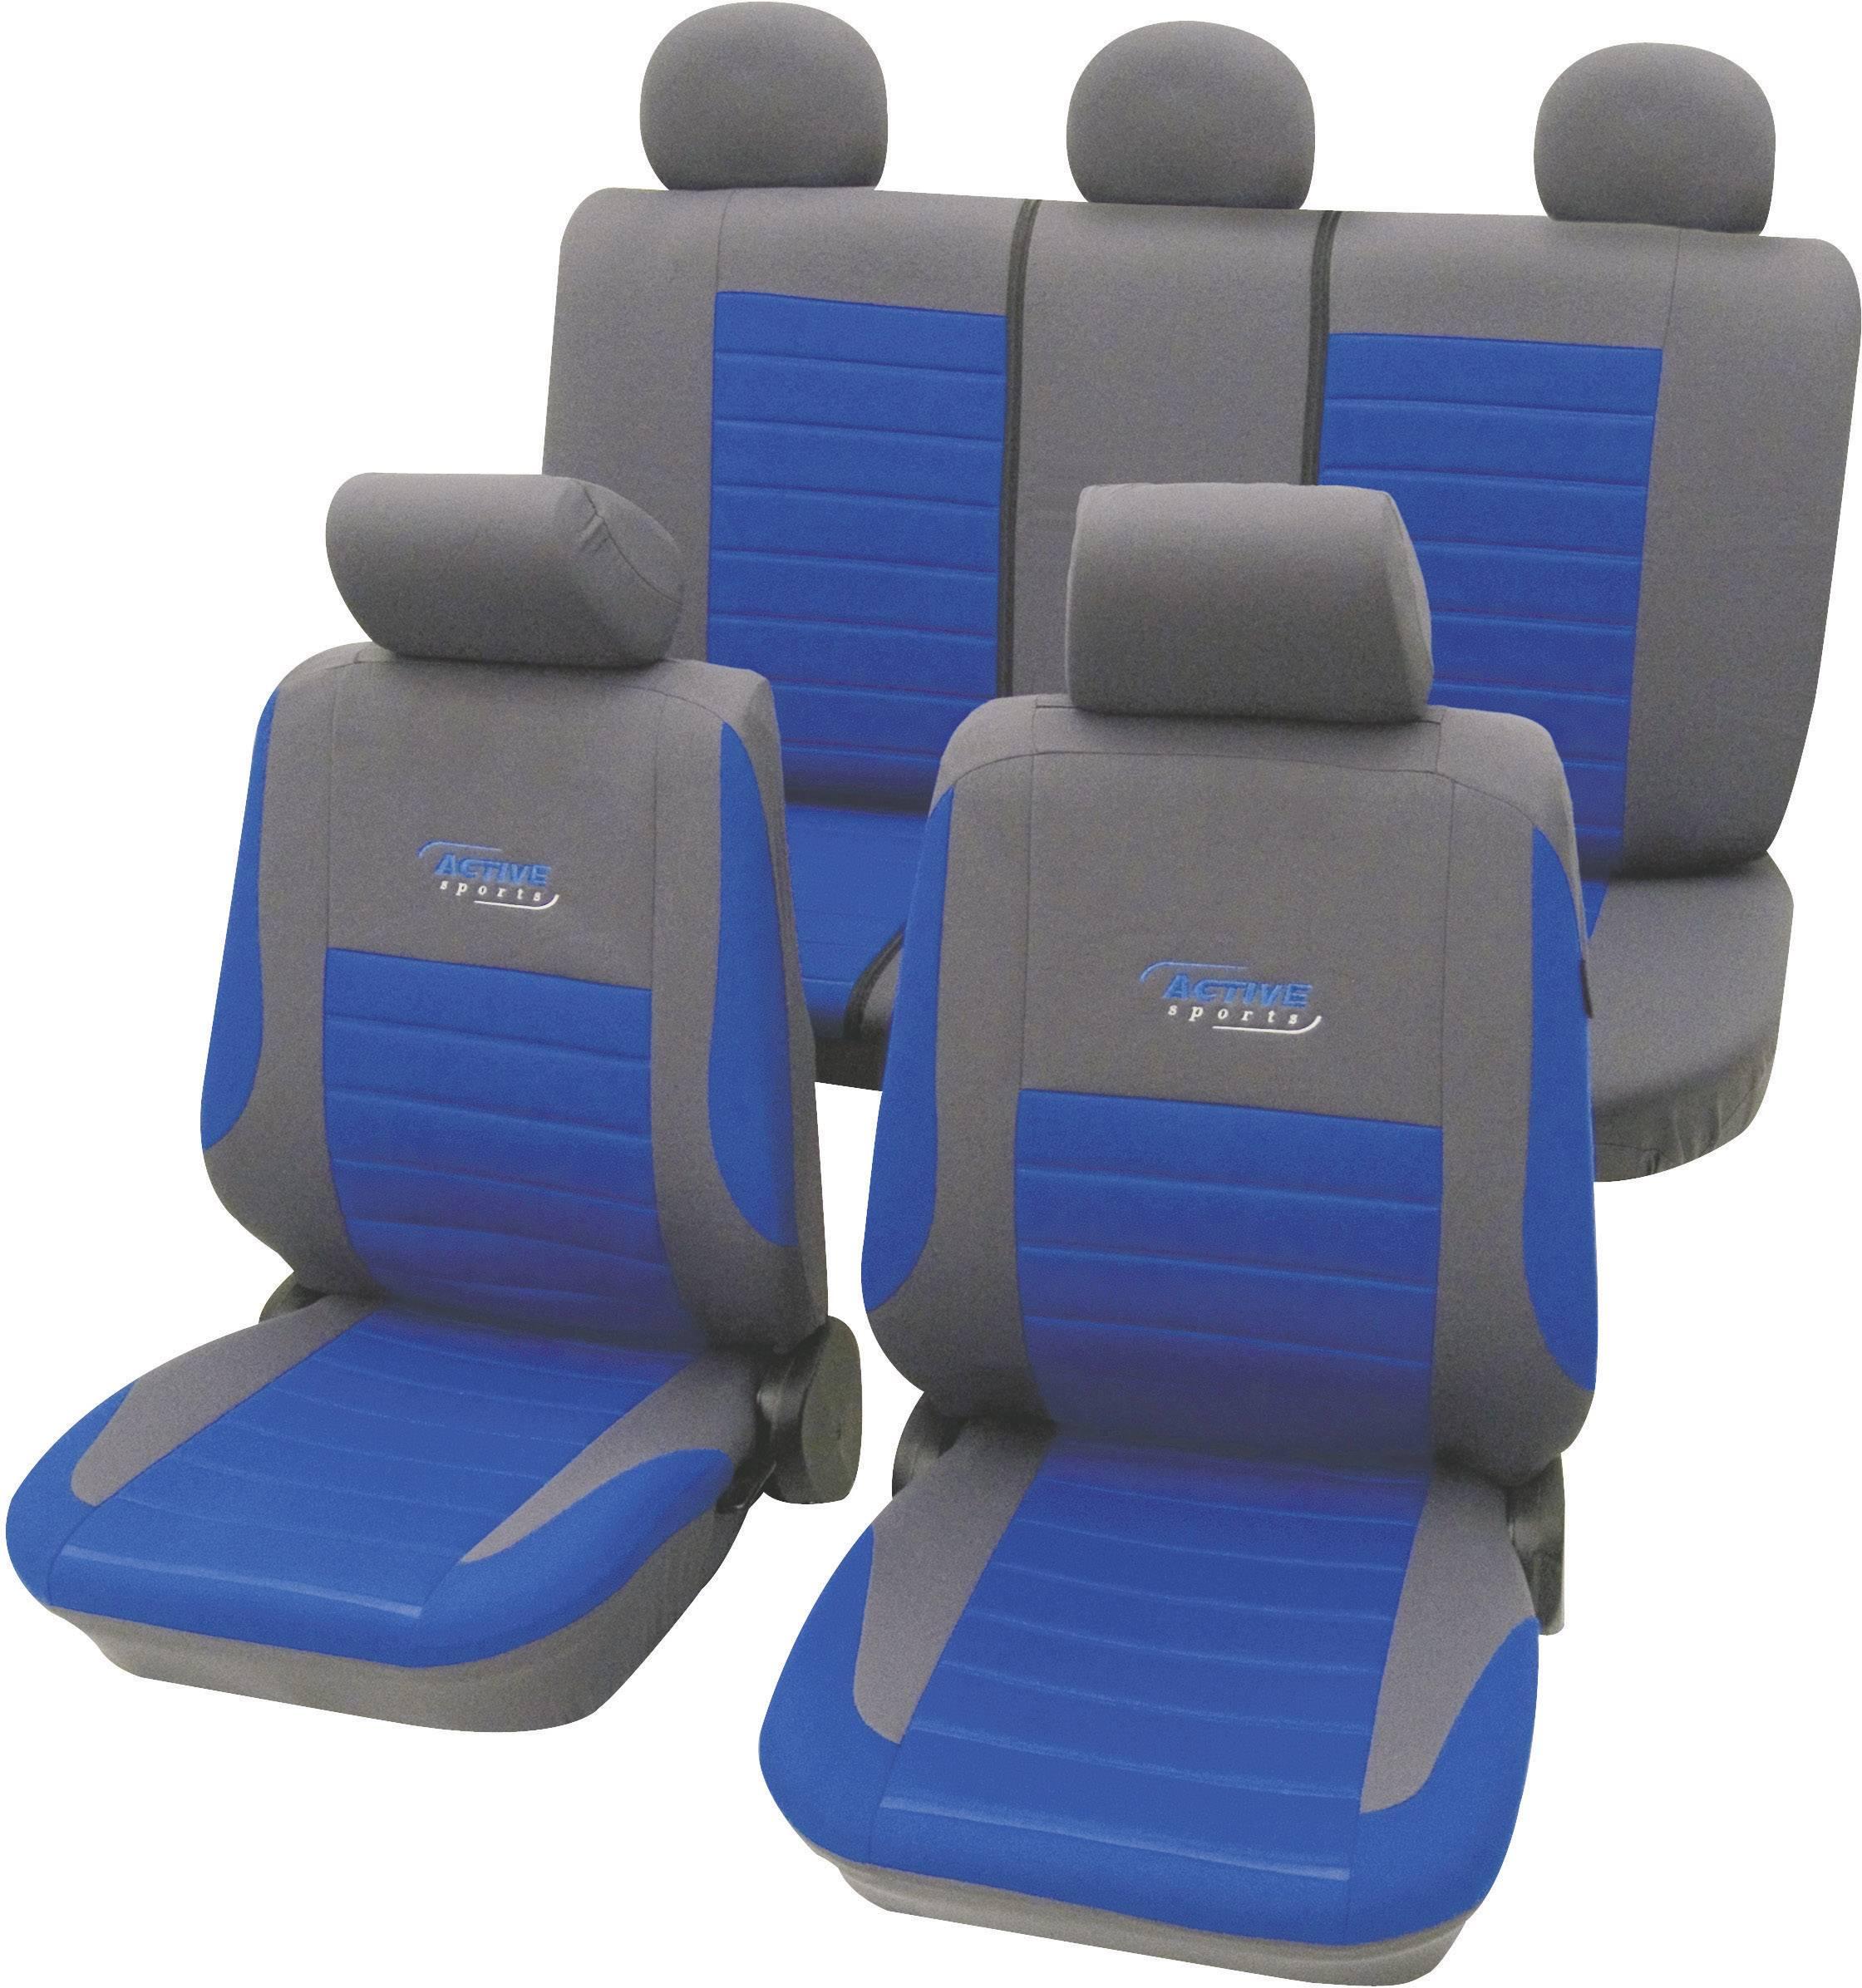 Autopoťahy cartrend Active 60120, 11-dielna, polyester, modrá